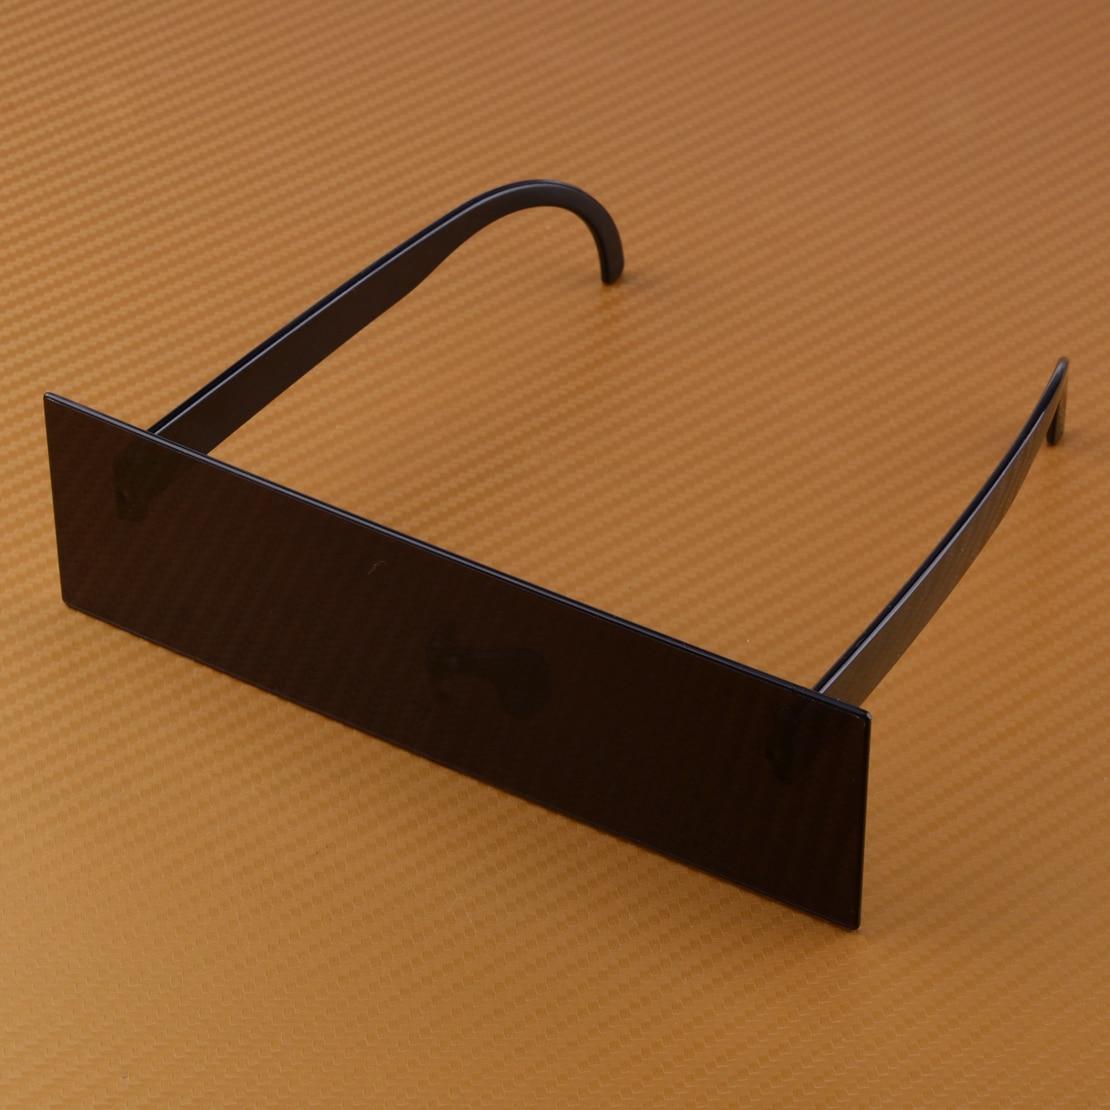 fd9dc2c0e07 Fancy Glasses Photobooth Props Censorship One-piece Black Bar Internet  Sunglasses Eye Covered for Costume